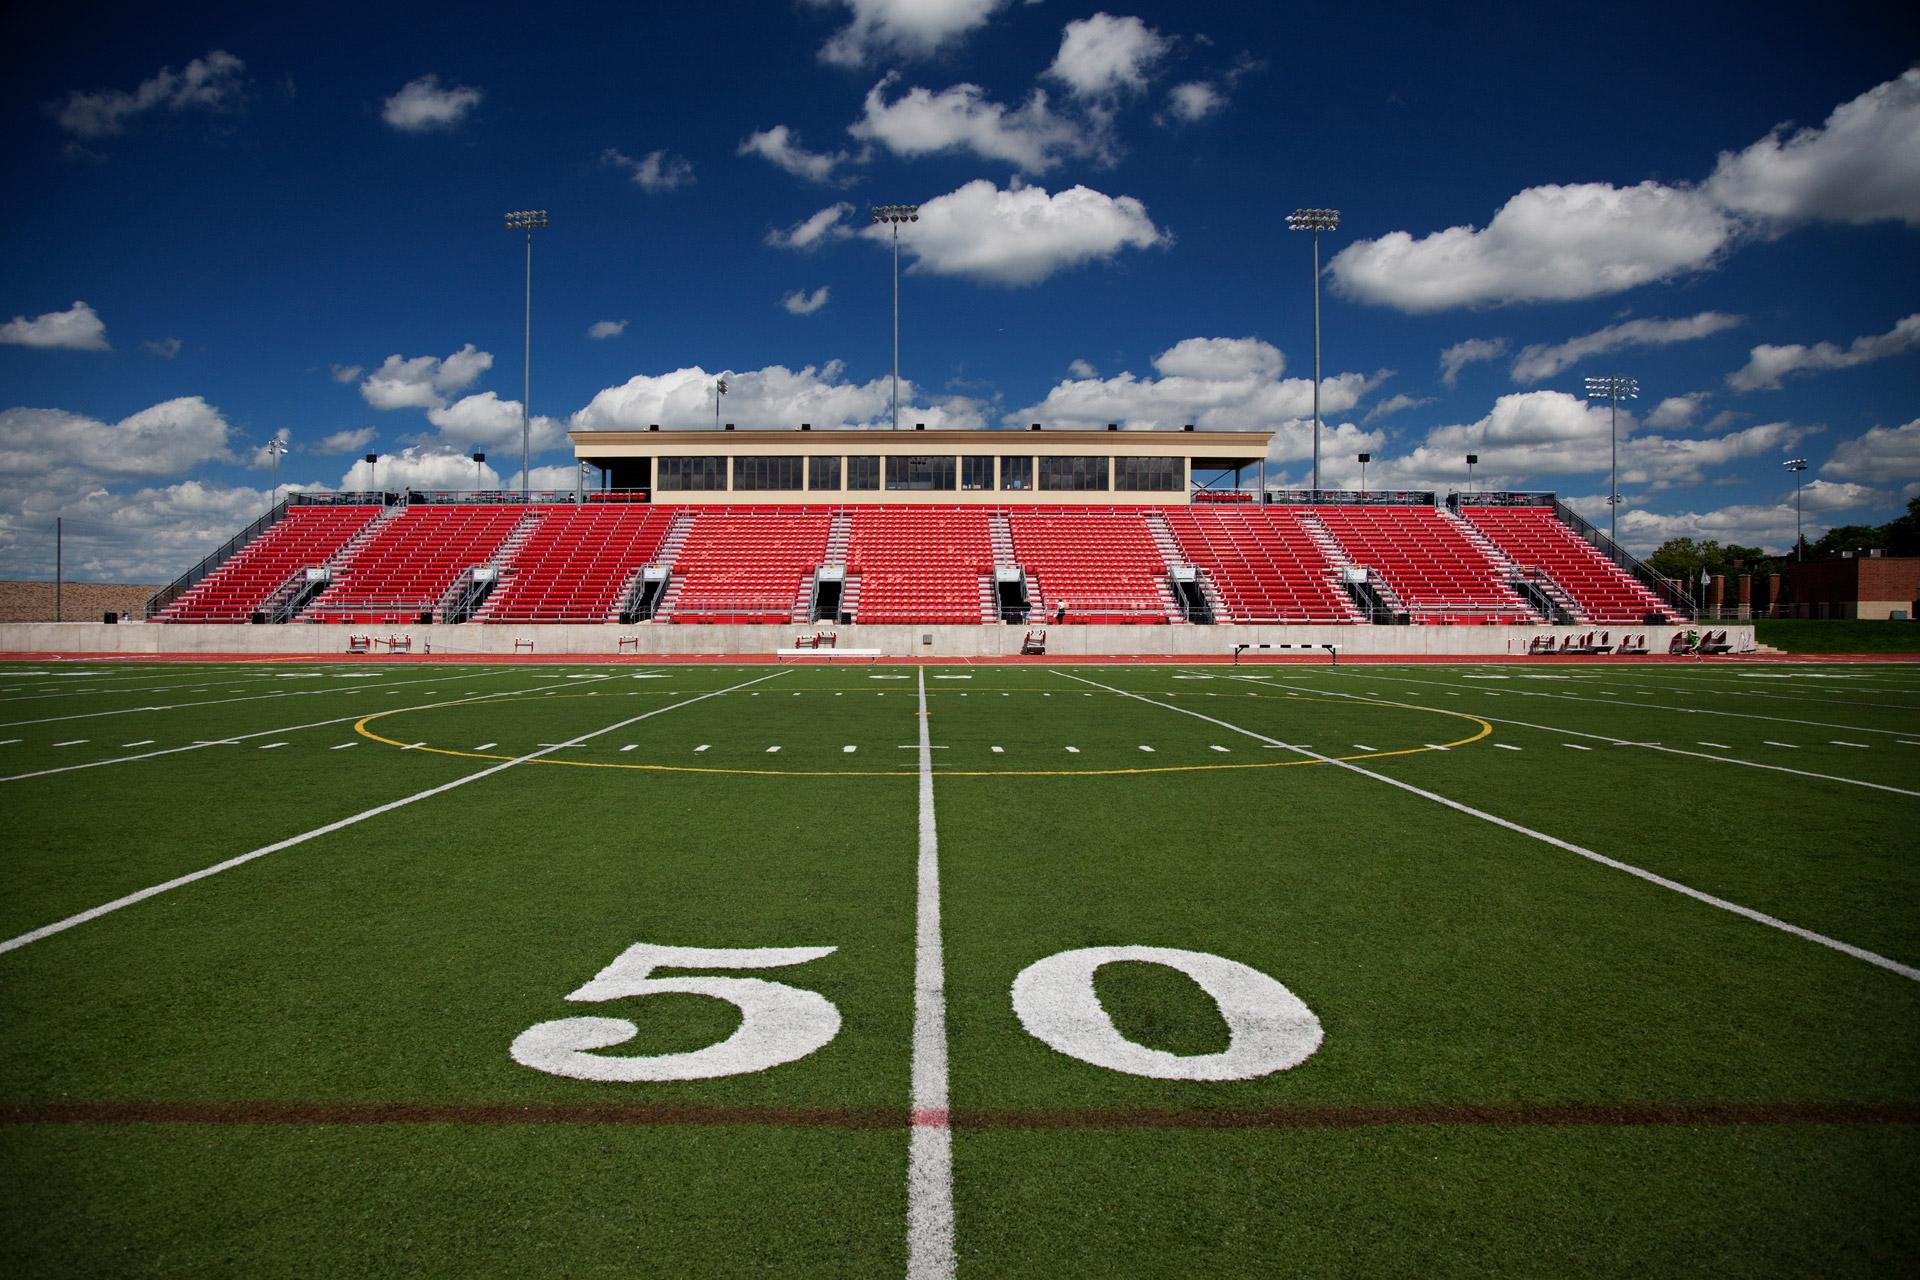 Sports stadium arena photographer